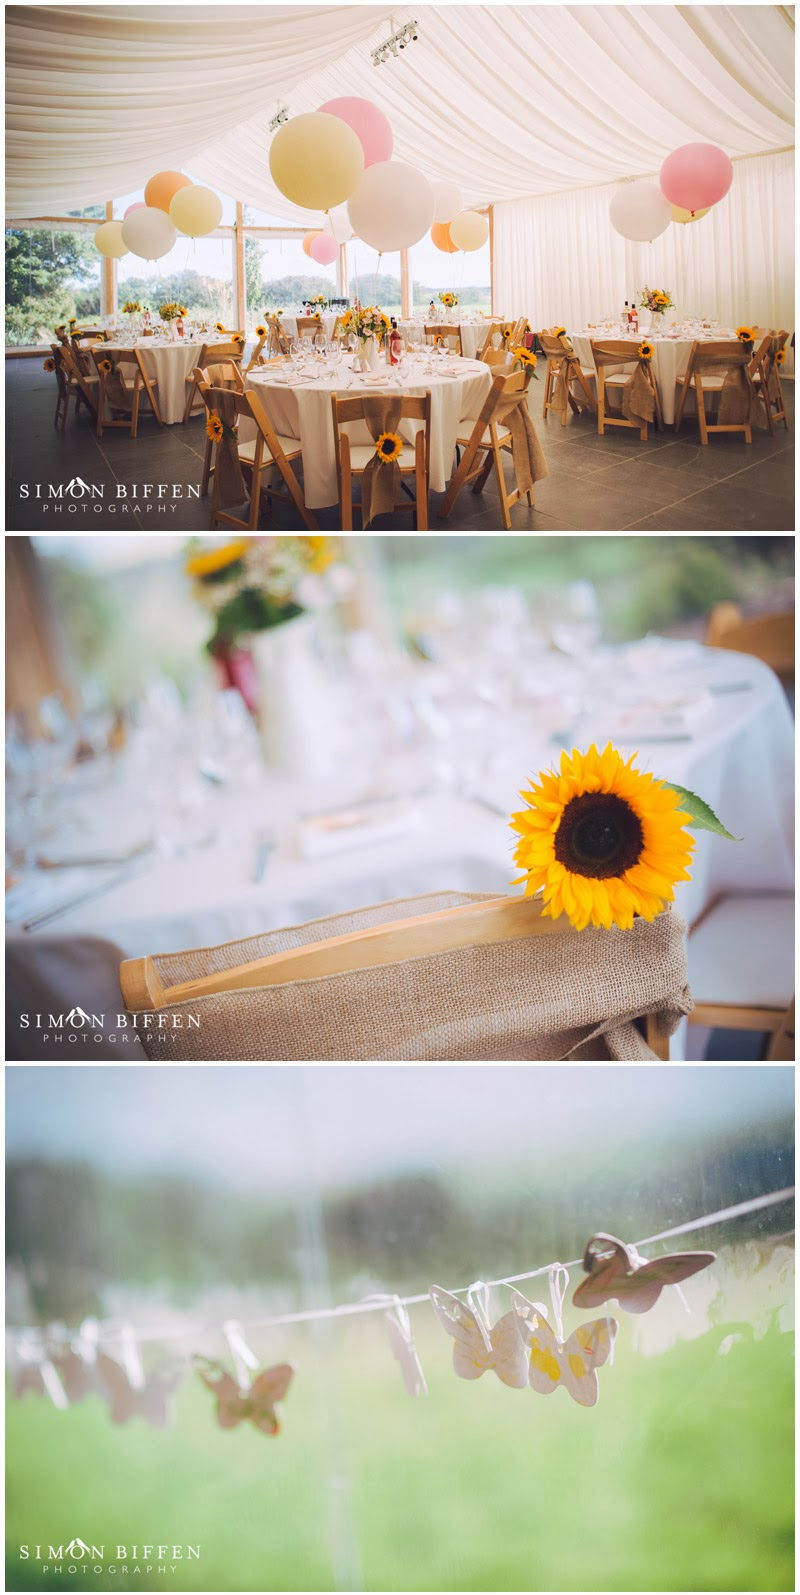 Wedding details Trevenna Cornwall